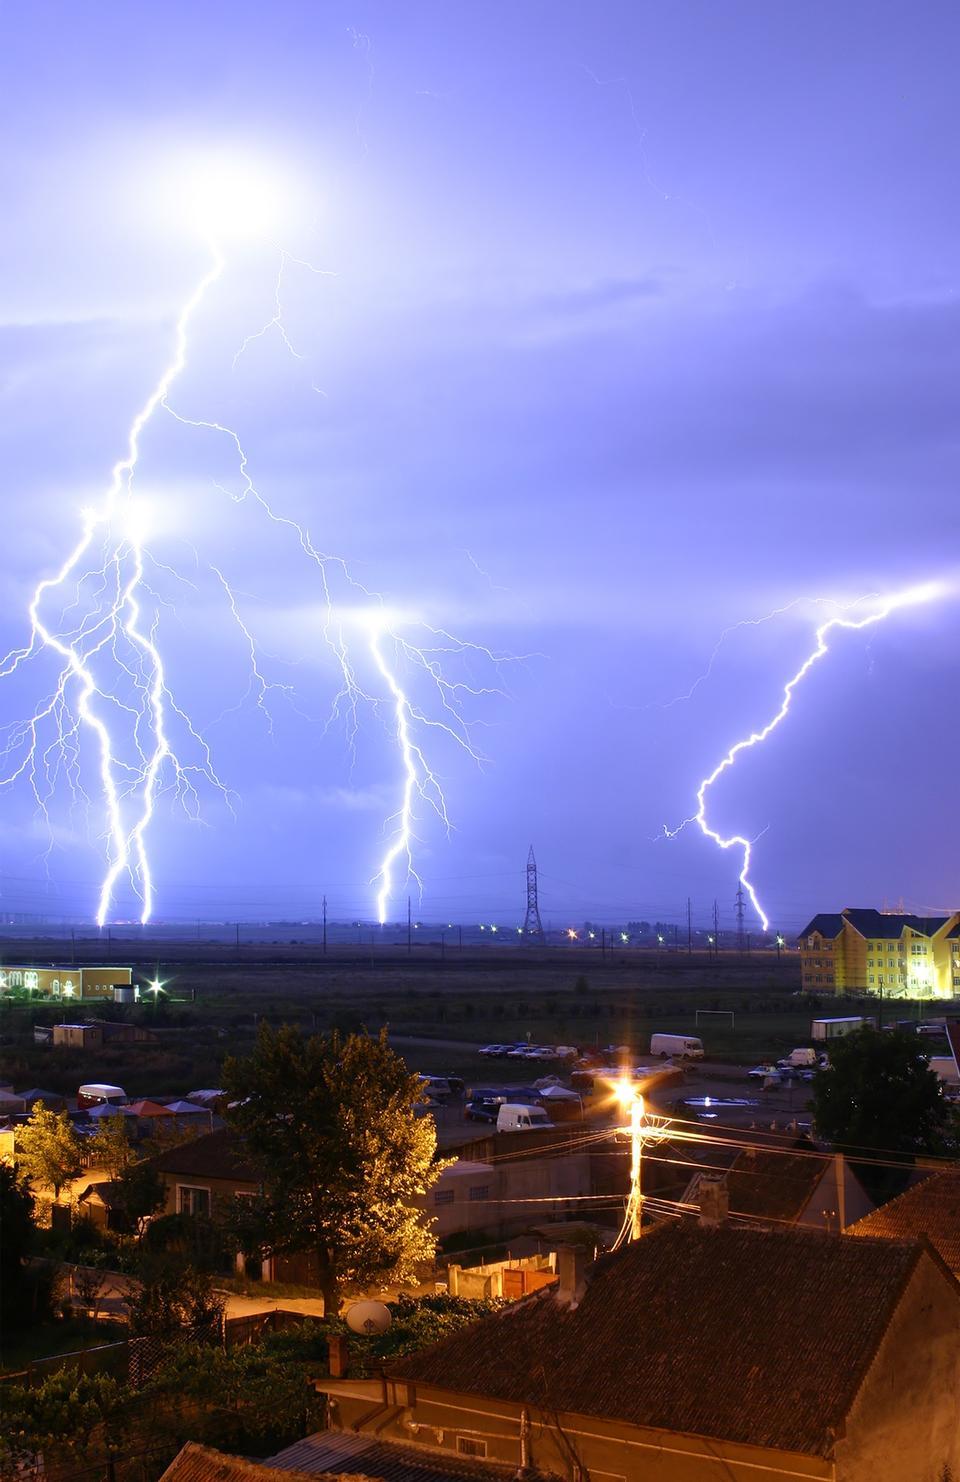 Free Lightning over the outskirts of Oradea, Romania